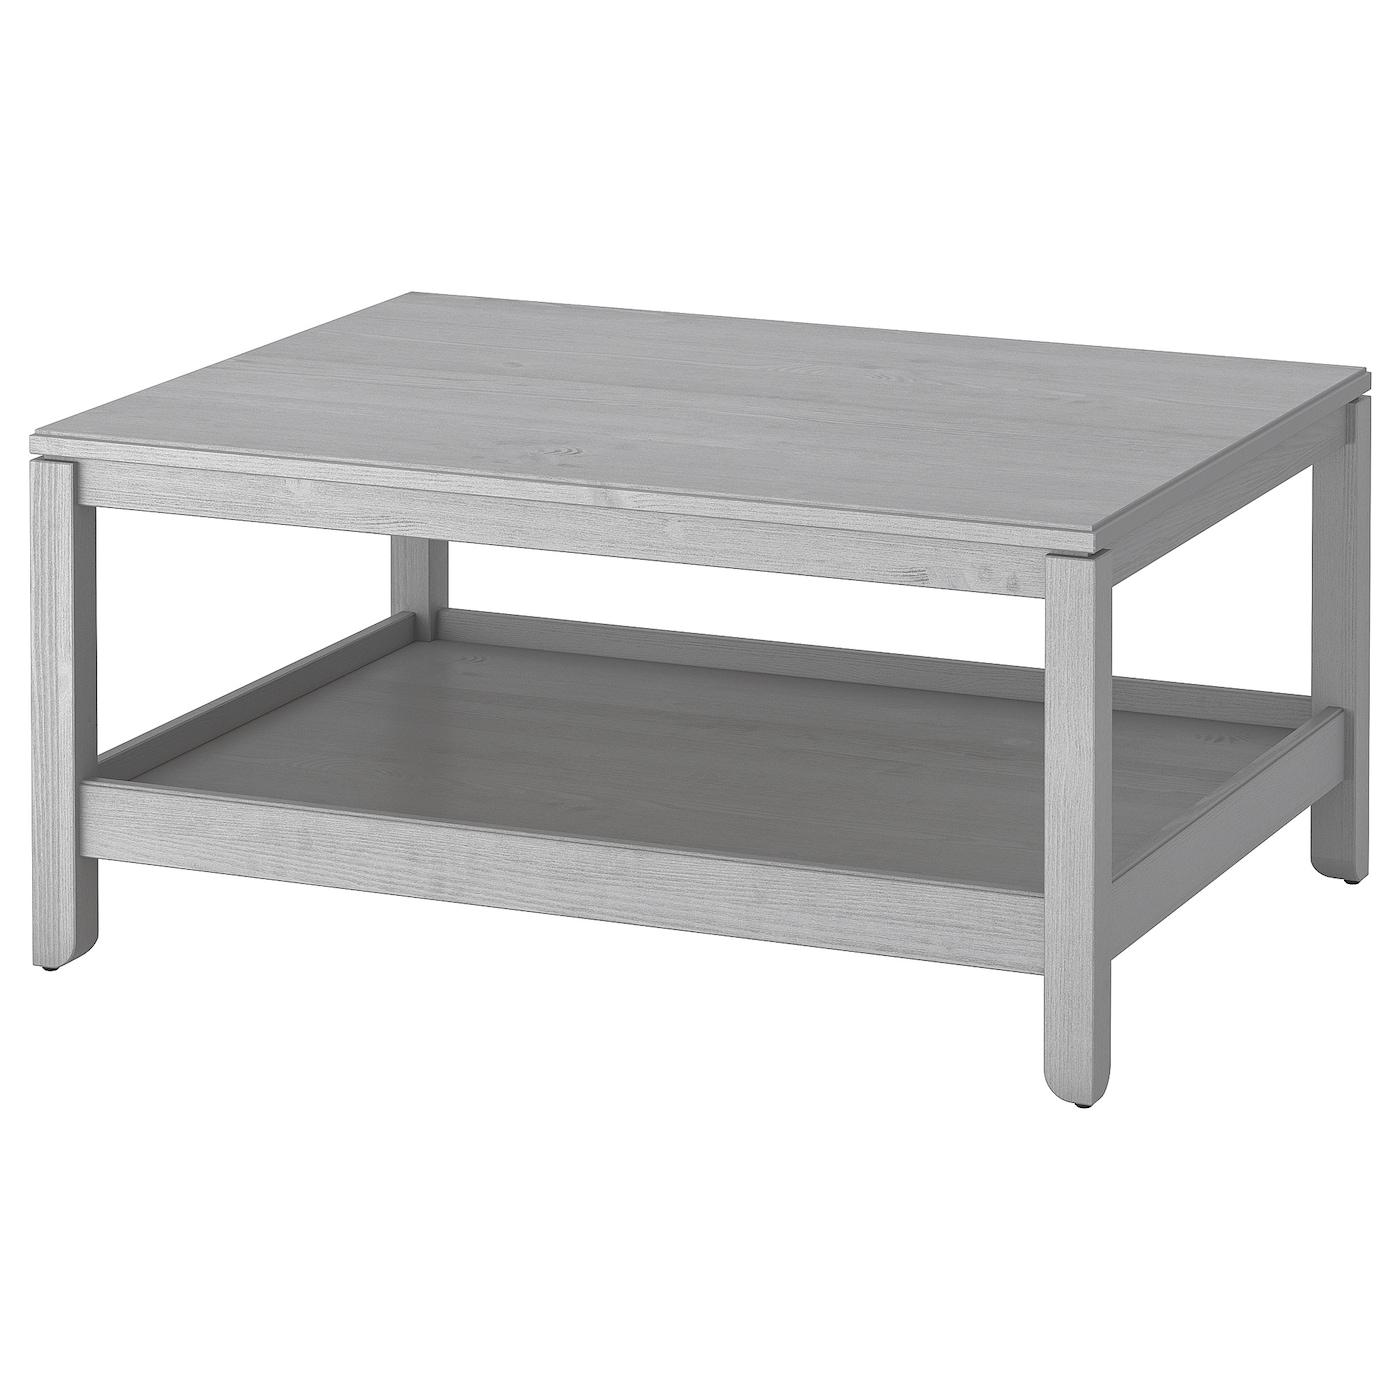 Lack Coffee Table Black Brown 353 8x215 8 90x55 Cm Ikea [ 1400 x 1400 Pixel ]